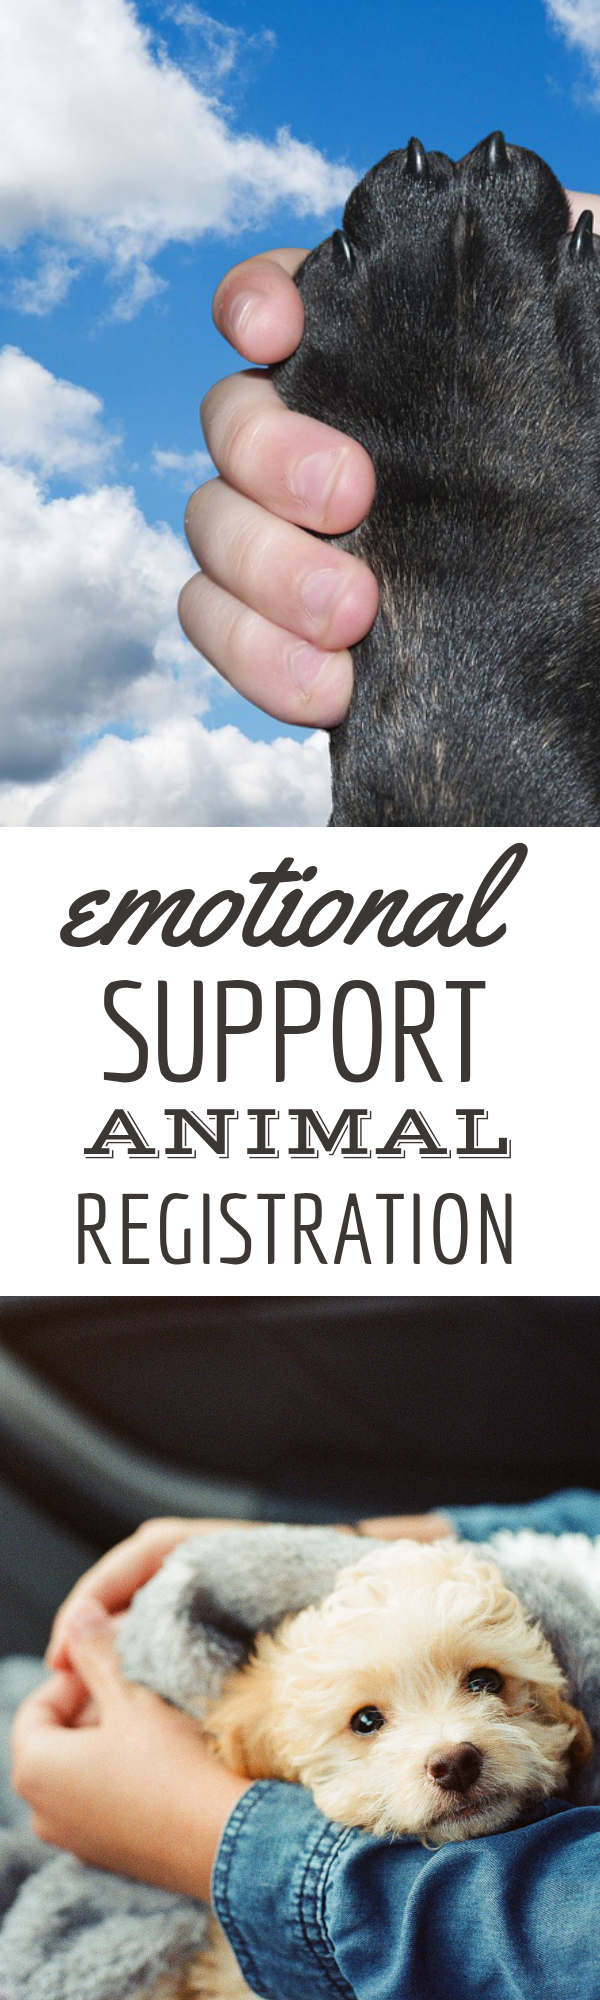 Legitimate Emotional Support Animal Registration